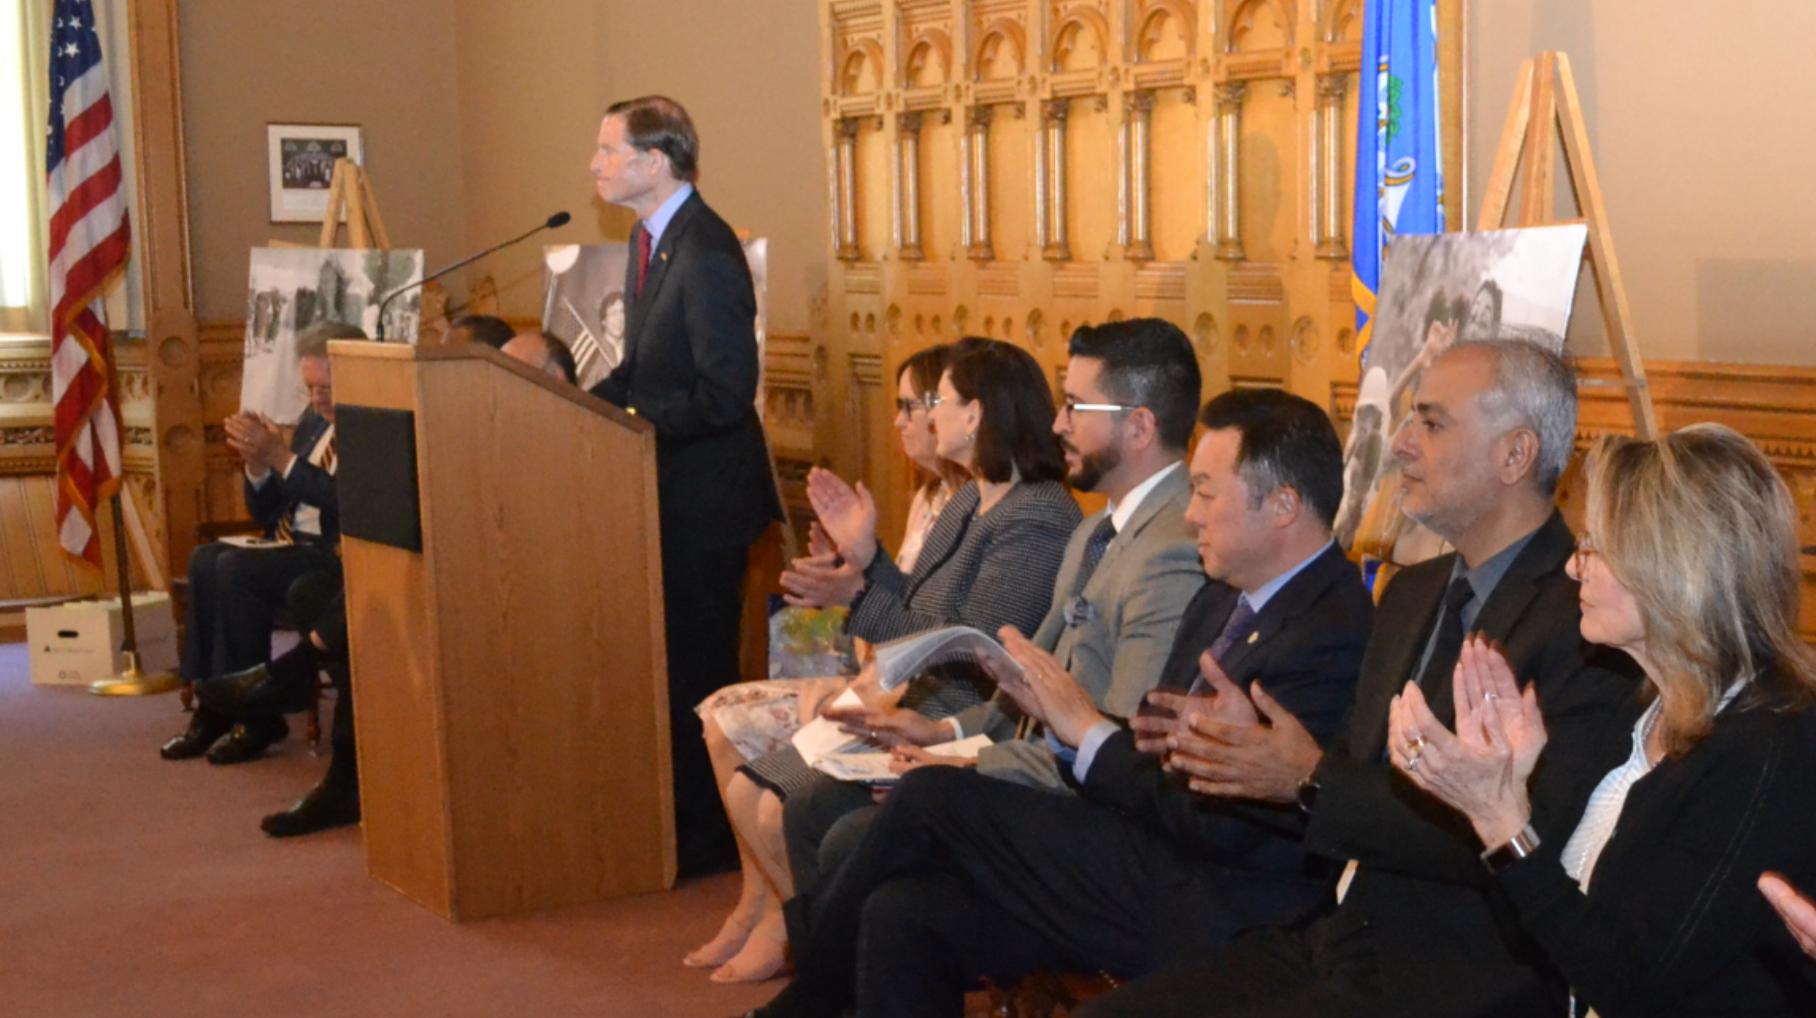 Connecticut U.S. Senator Richard Blumenthal at Immigrant Day ceremonies.